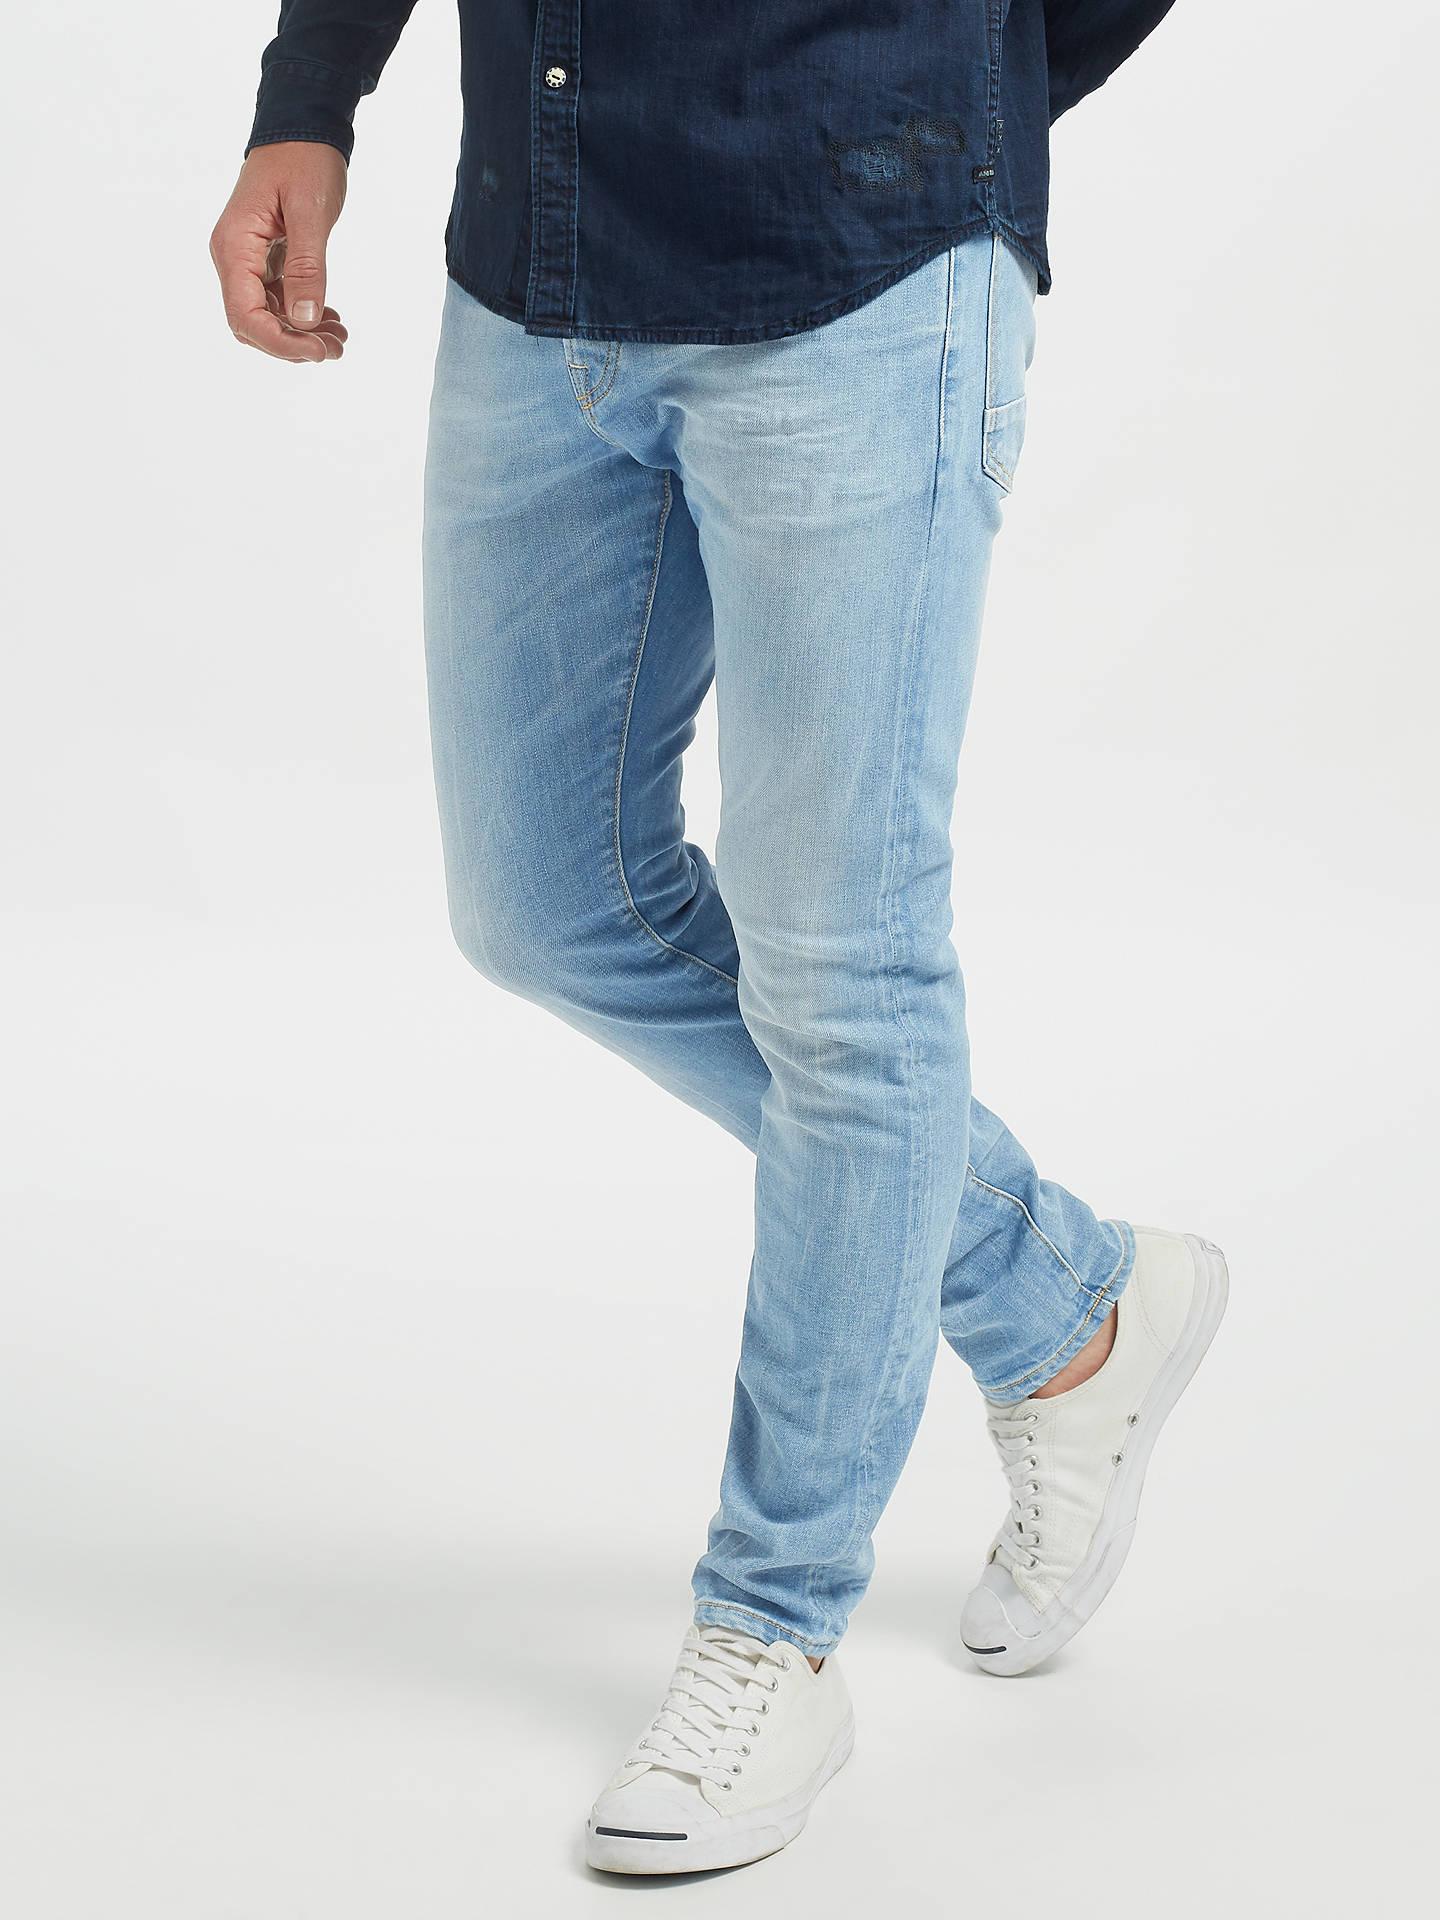 Scotch & Soda Ralston Regular Slim Fit Jeans, Light Wash at John Lewis &  Partners